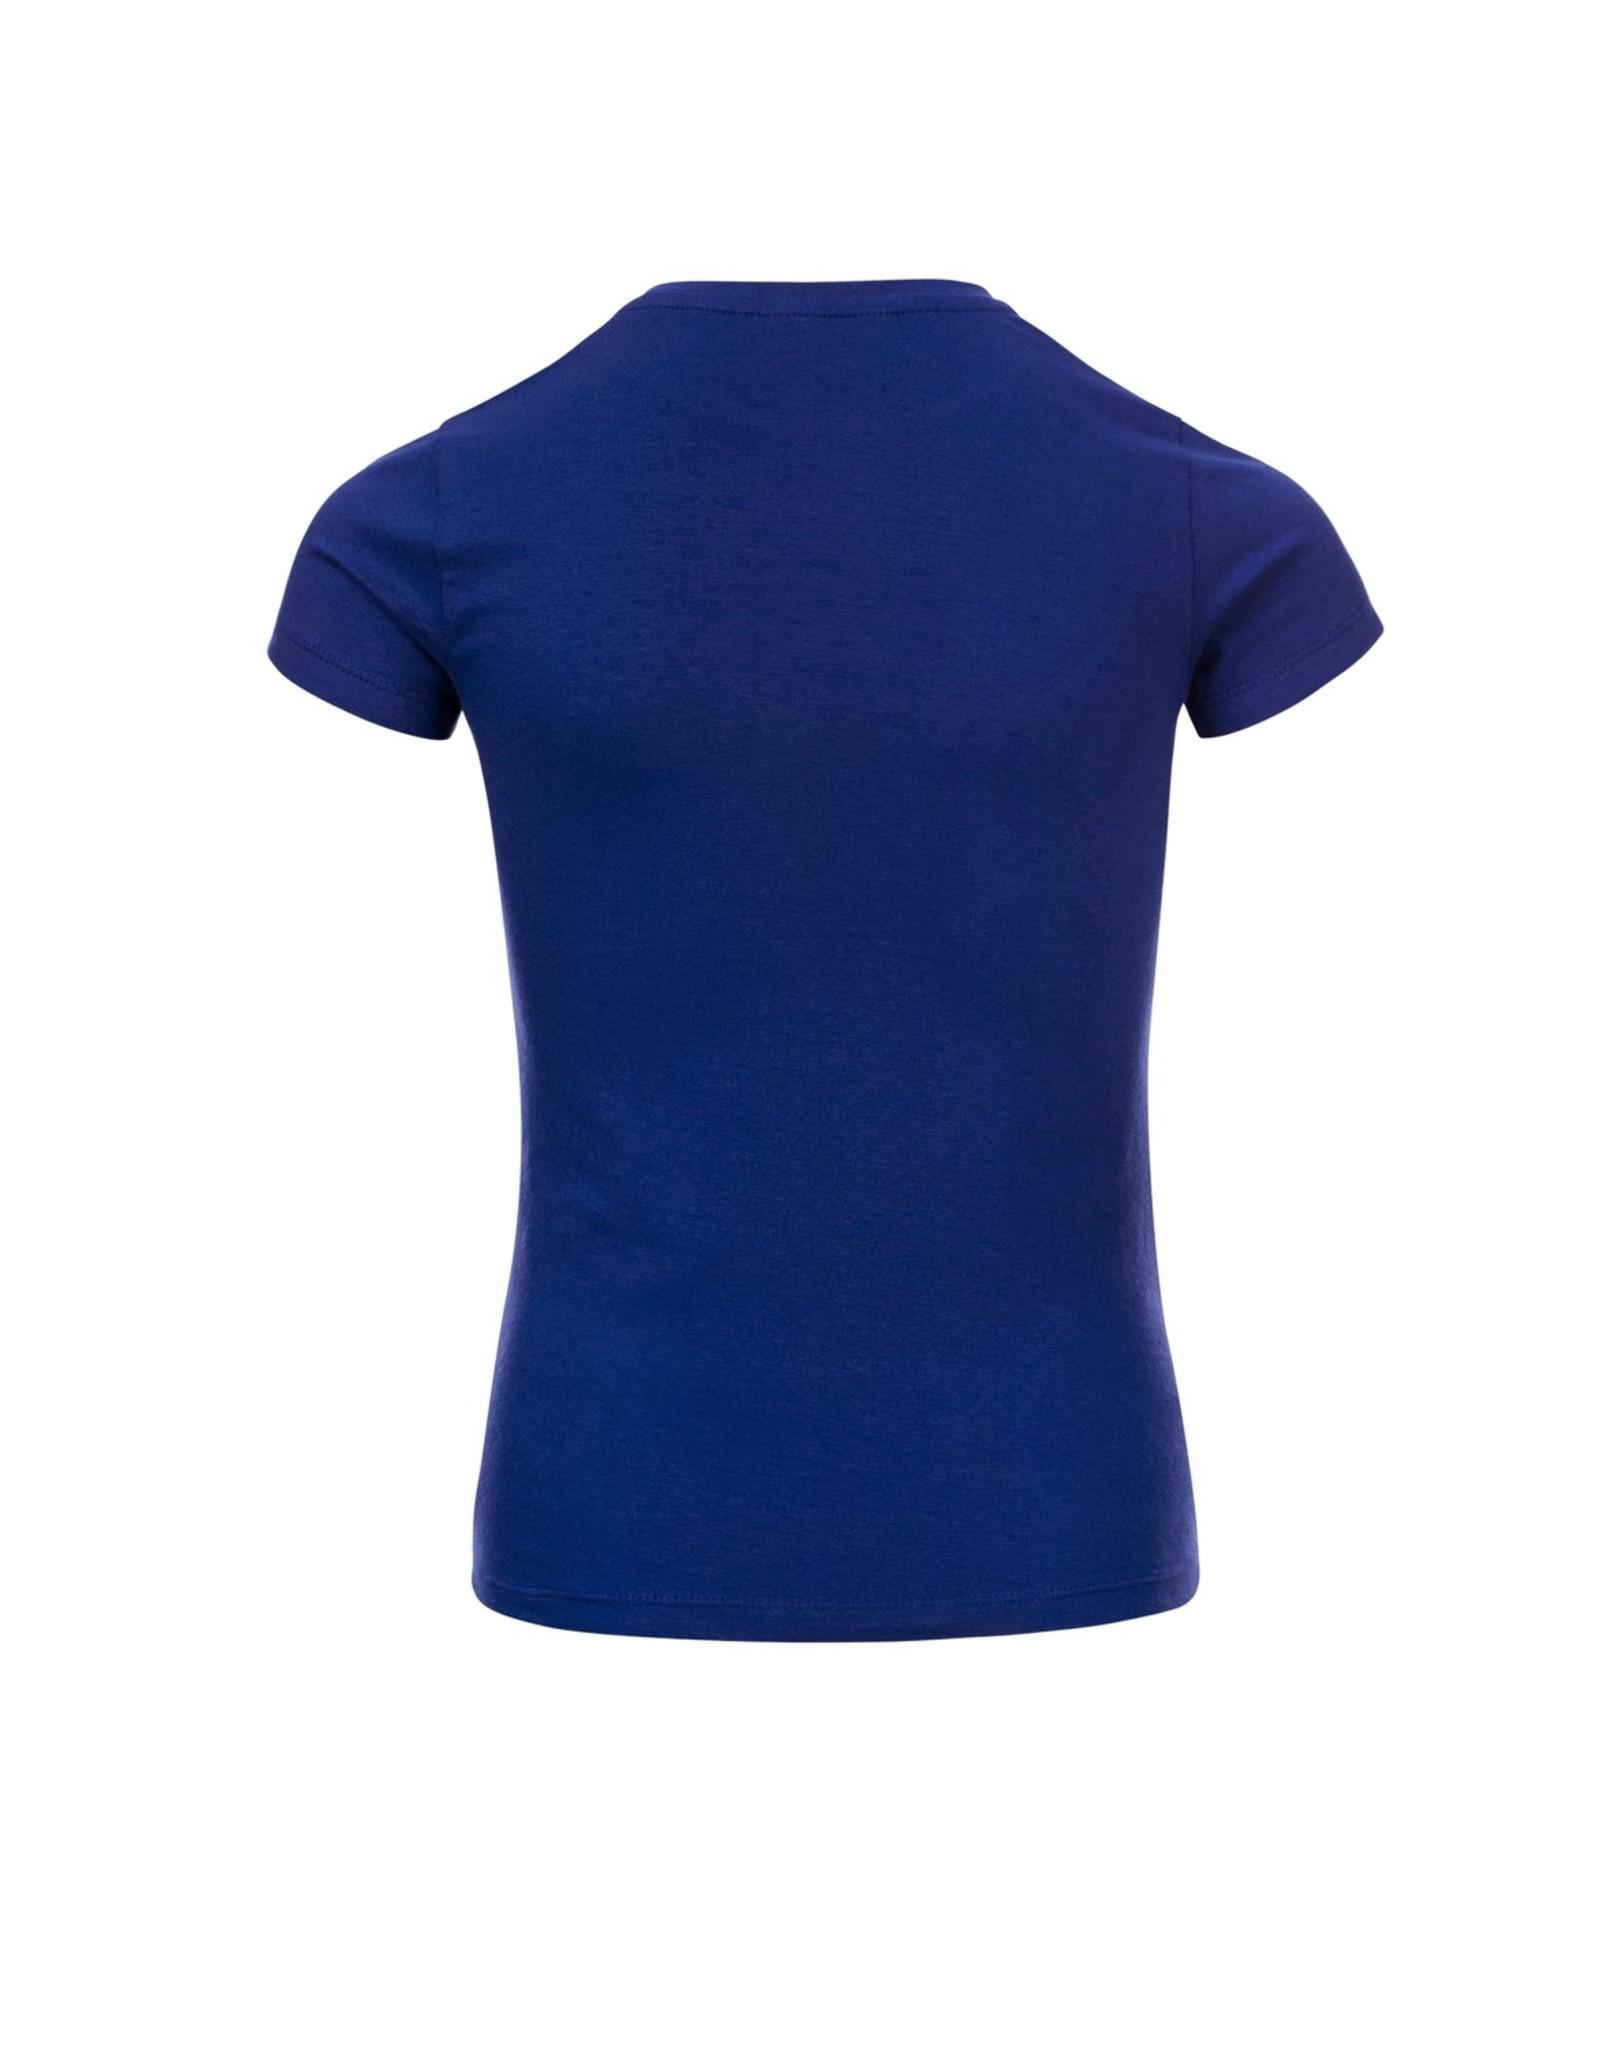 Looxs Revolution Girls T-shirt s/s lapis